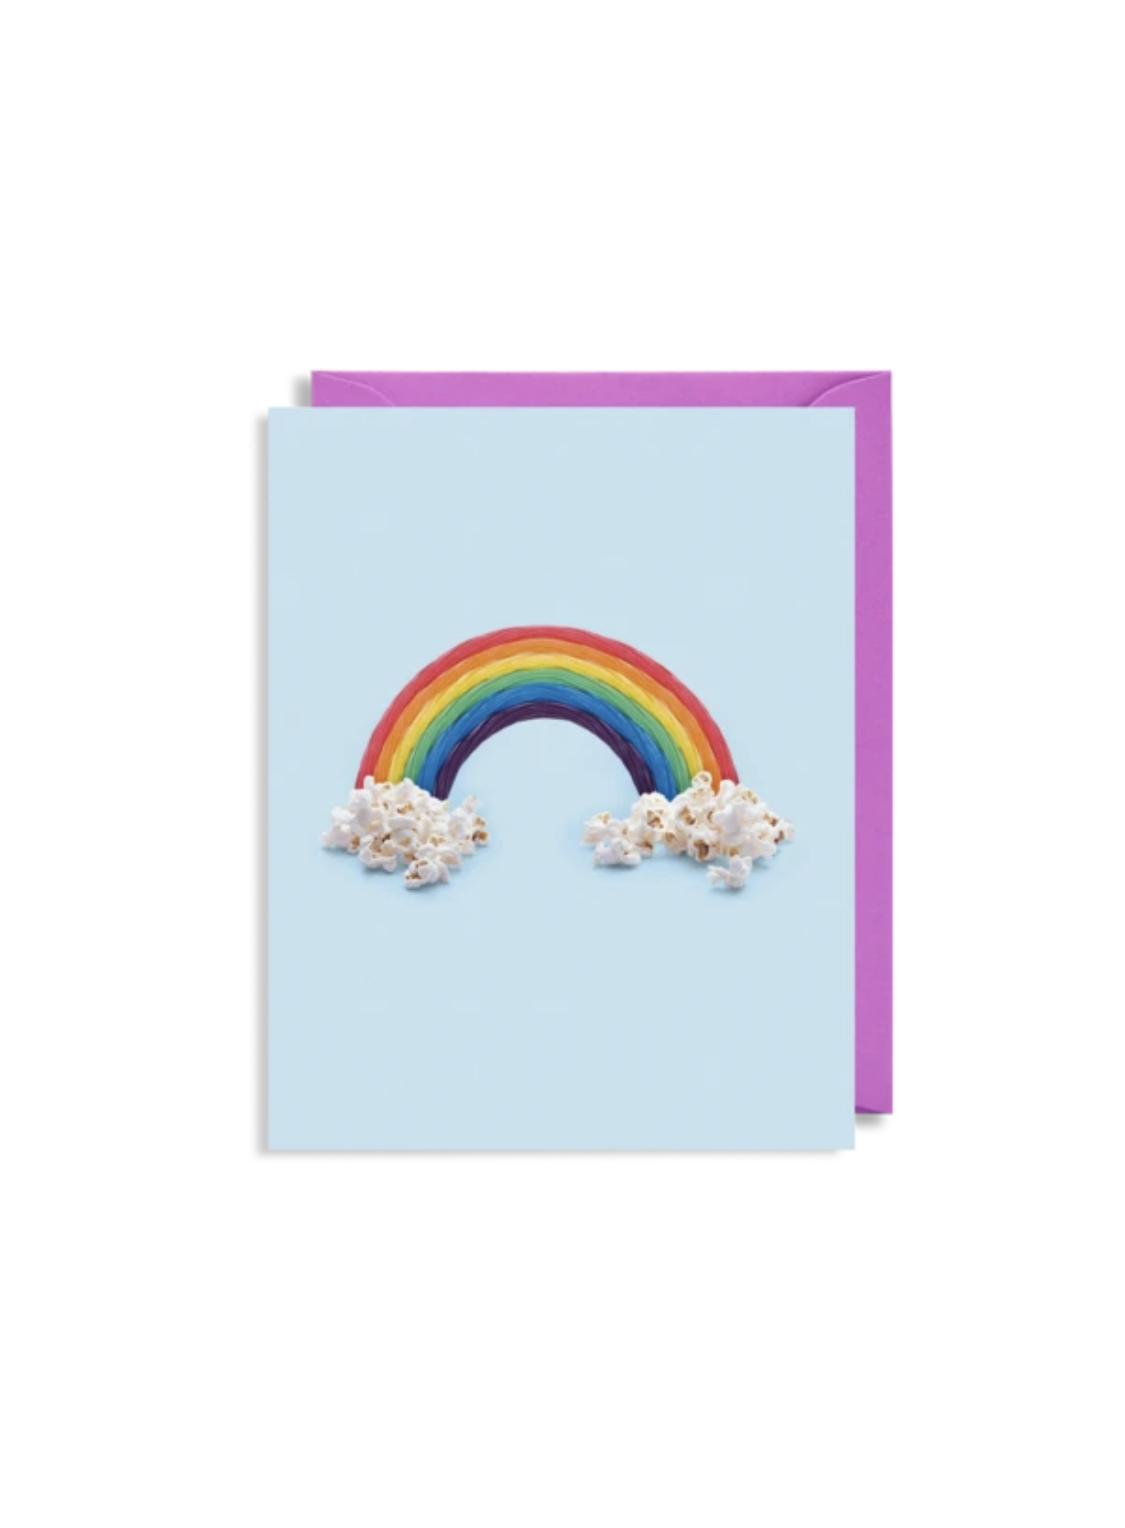 Card Thinking of You Lagom Mini Card - Rainbow 4537